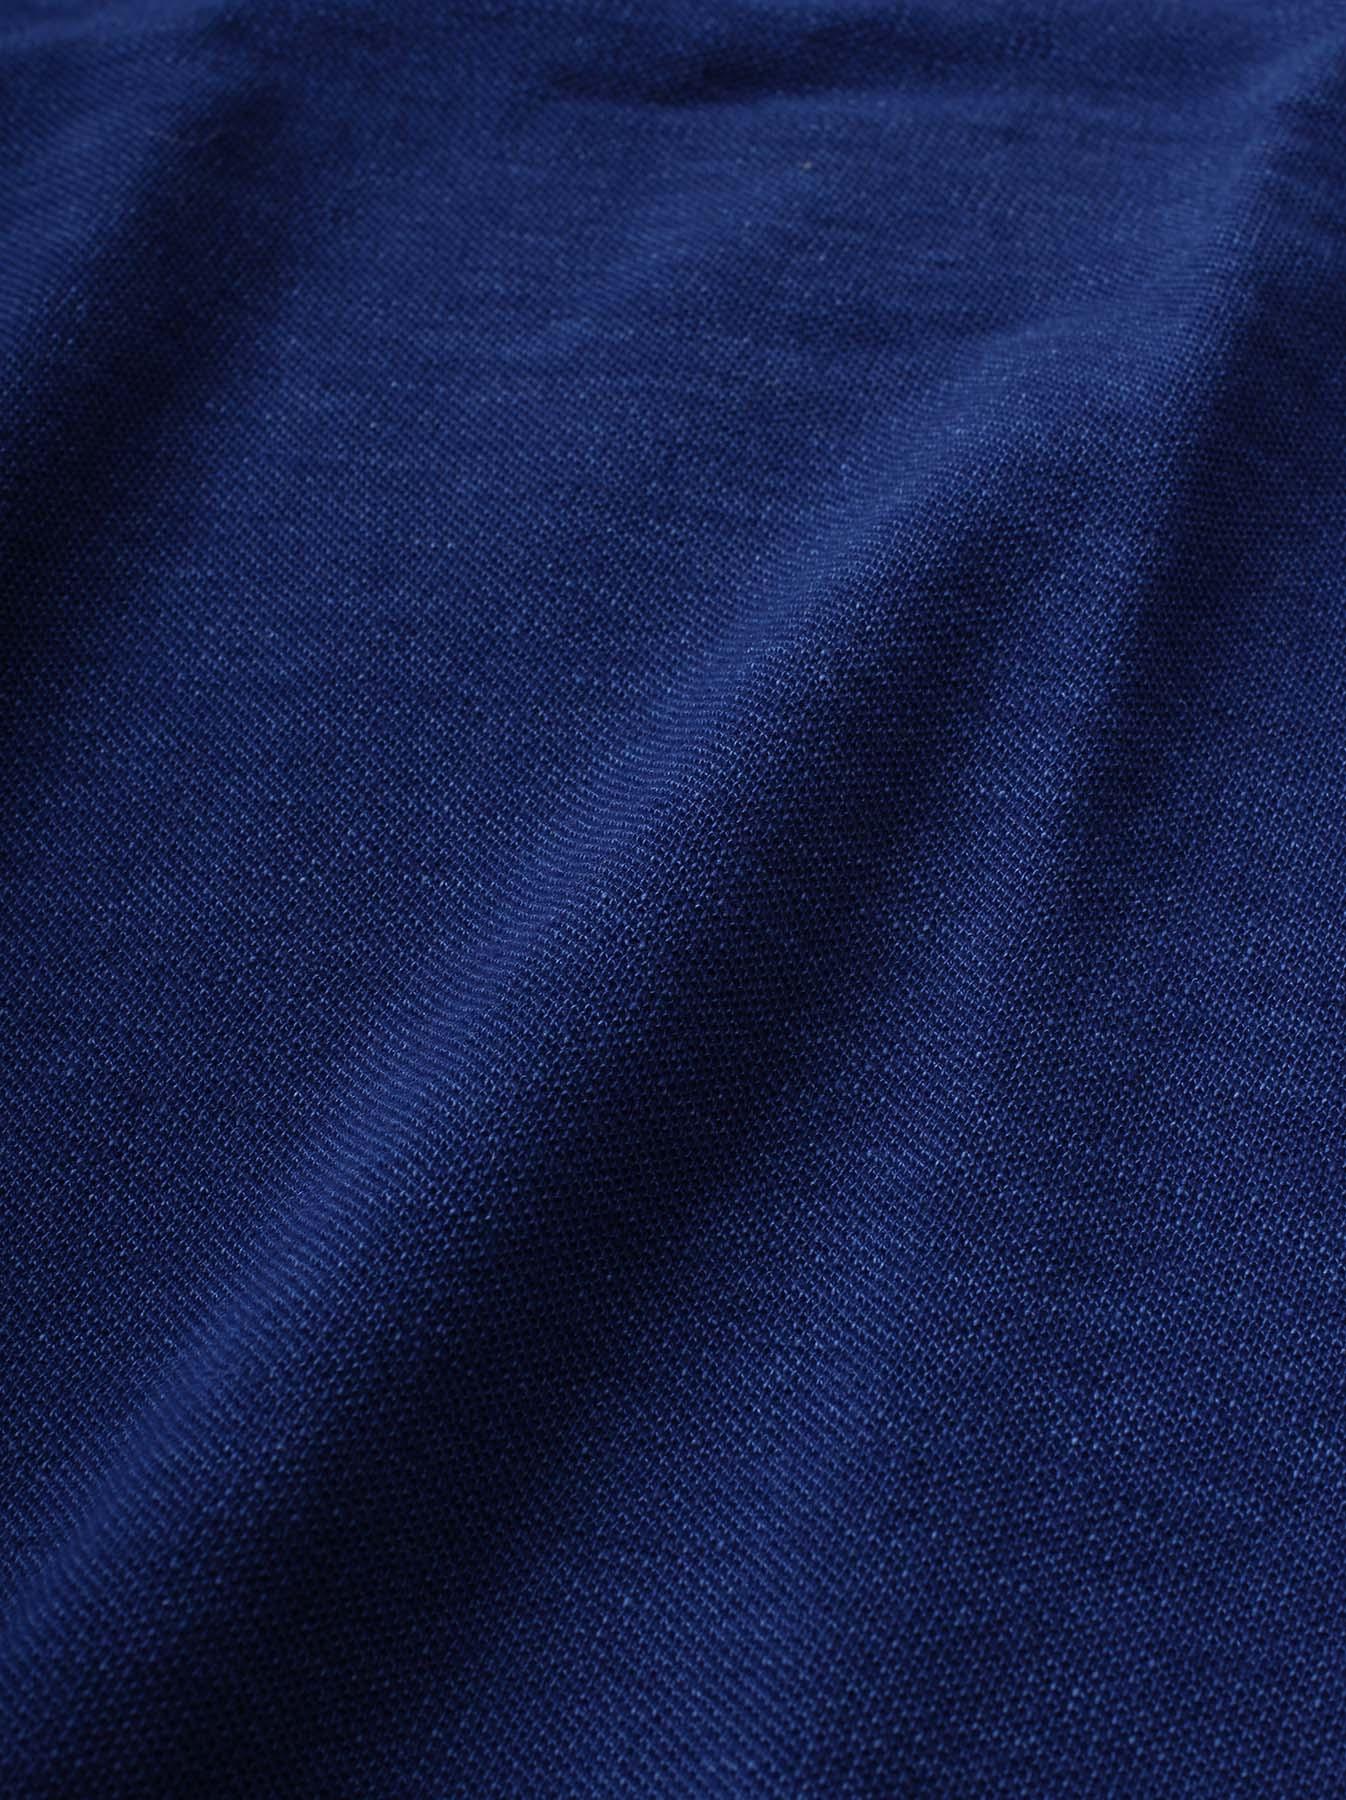 WH Indigo Ultimate Pique T-shirt Distressed-8